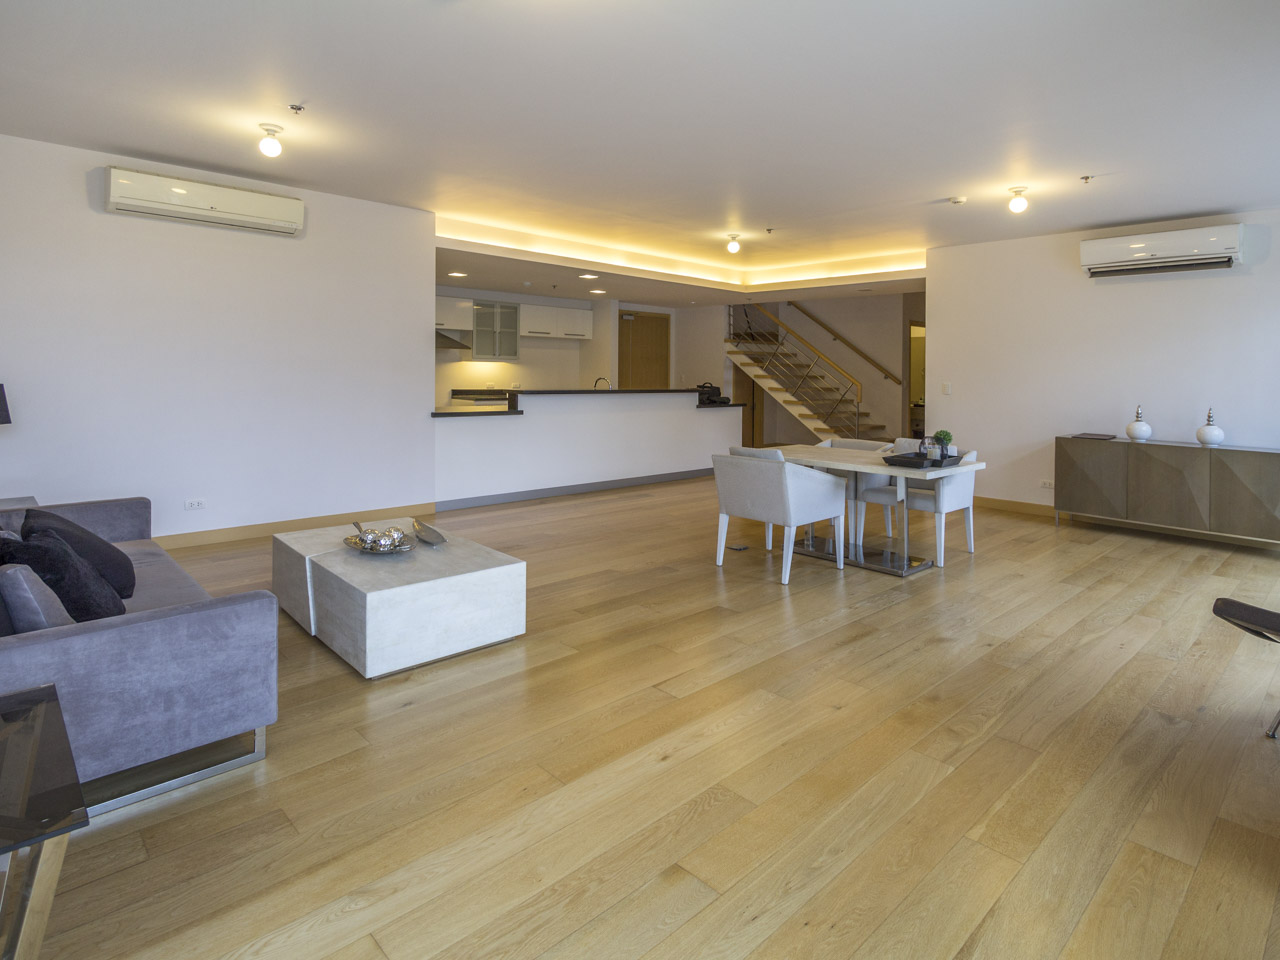 3 bedroom condo for sale in 1016 residences cebu grand. Black Bedroom Furniture Sets. Home Design Ideas